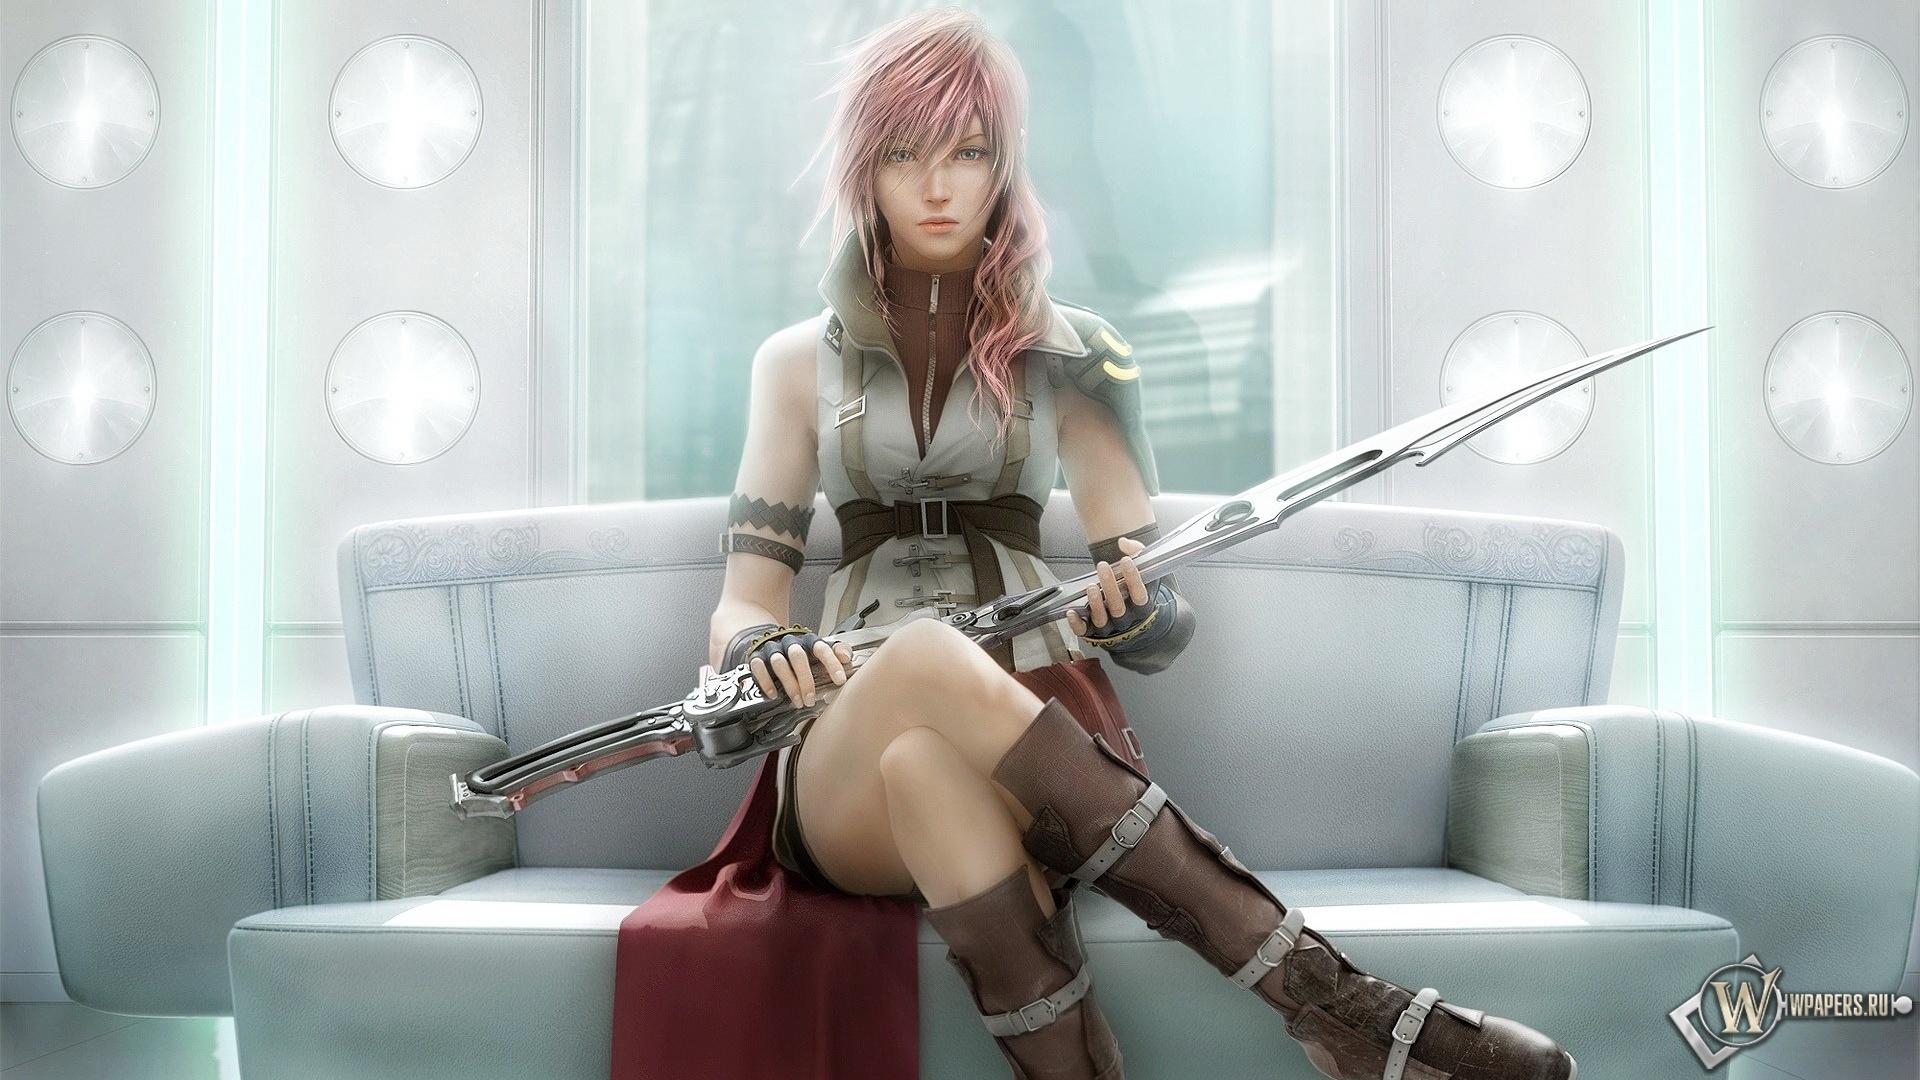 Final Fantasy XIII 1920x1080